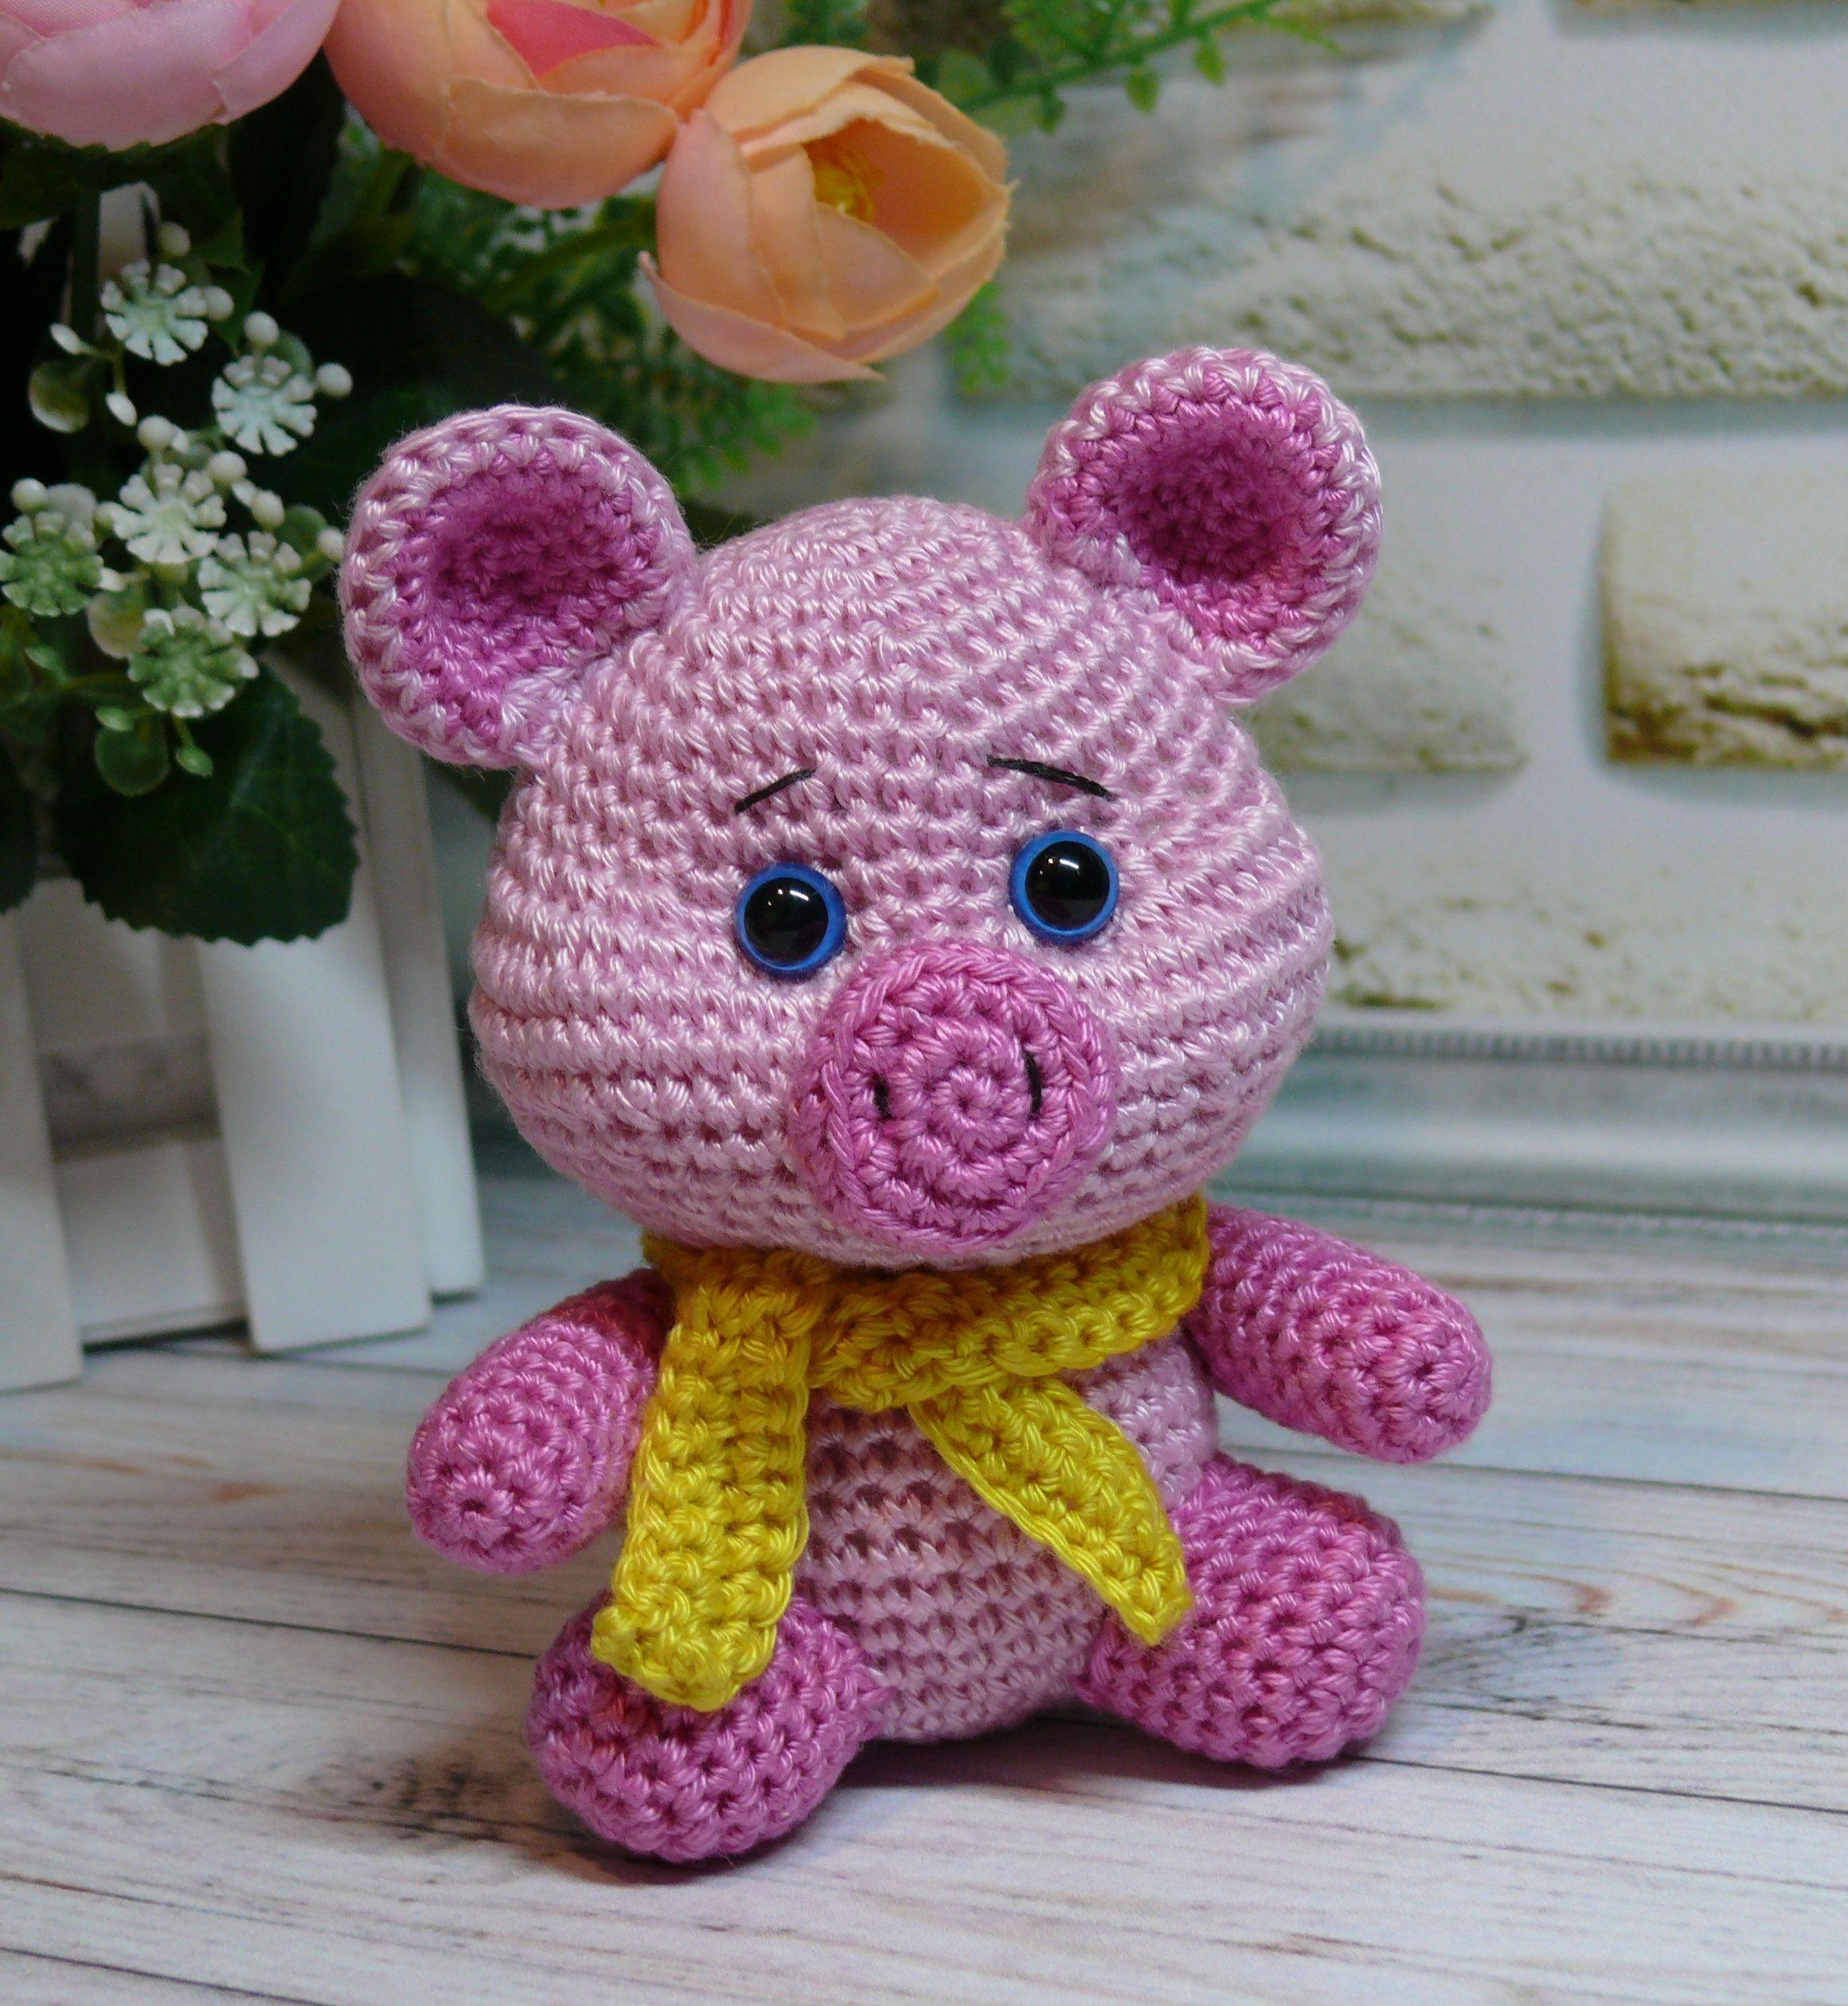 Amigurumi Piglet - FREE Crochet Pattern / Tutorial in ENGLISH ... | 2520x2321